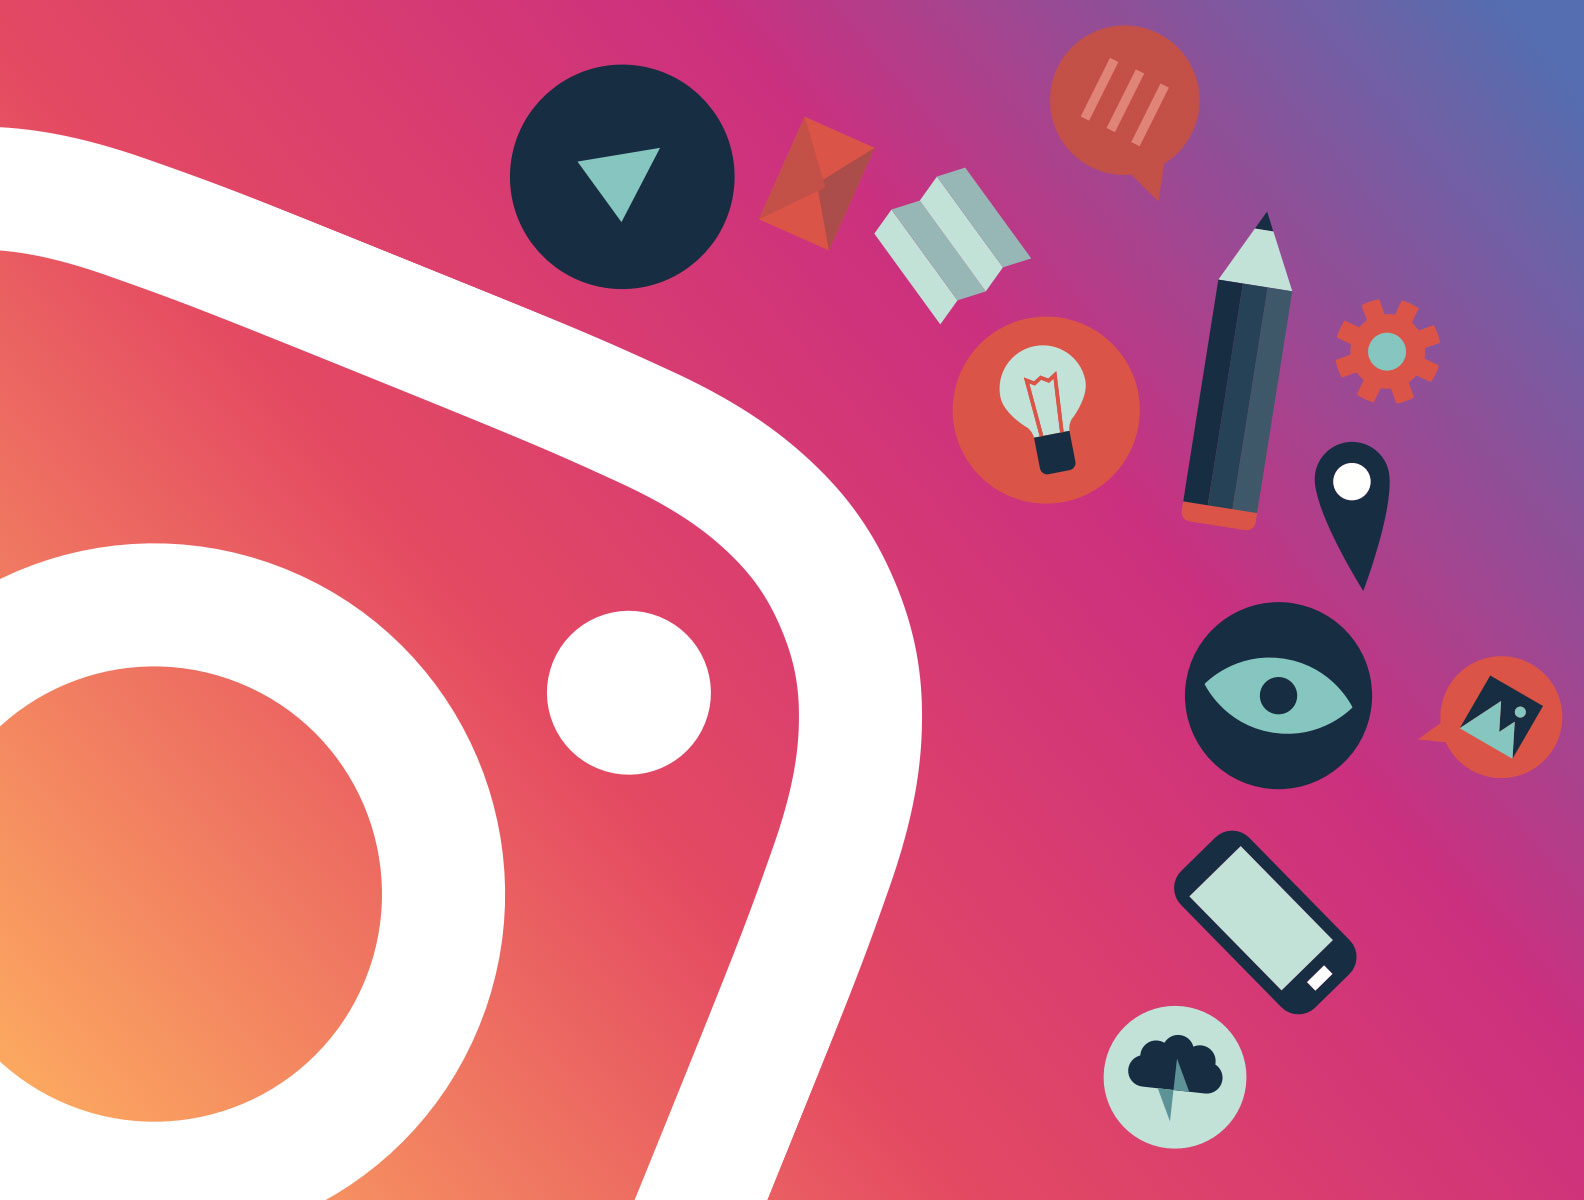 30 Ideias de Posts para Instagram Fantásticas!